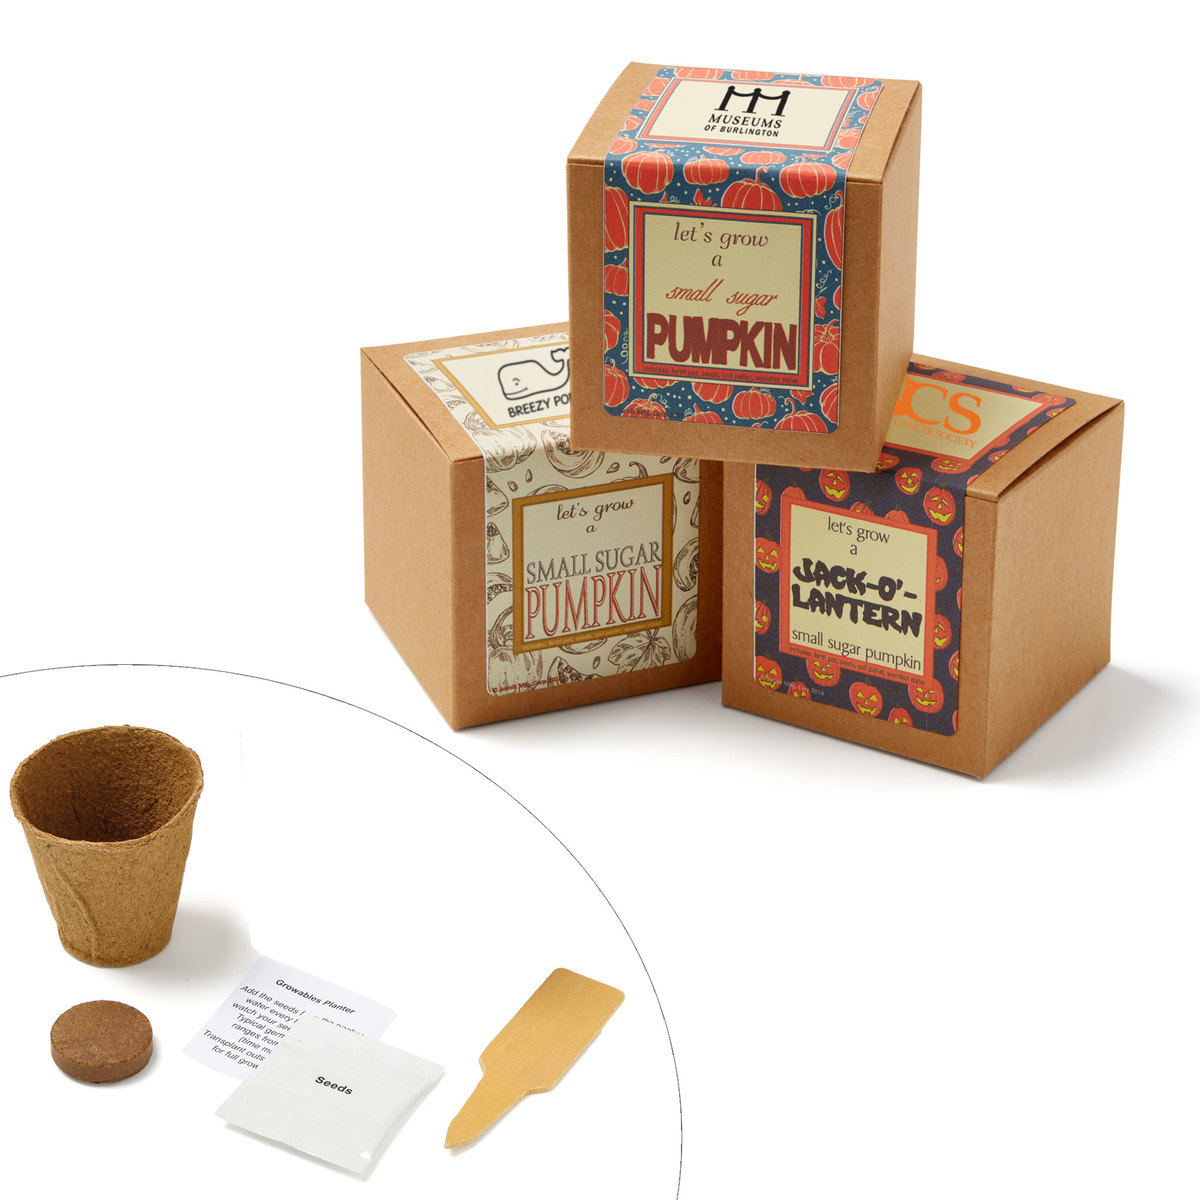 Gephart Marketing Solutions  sc 1 st  Gephart Marketing Solutions & Small Sugar Pumpkin Growables Planter in Kraft Gift Box - JK-1568 ...